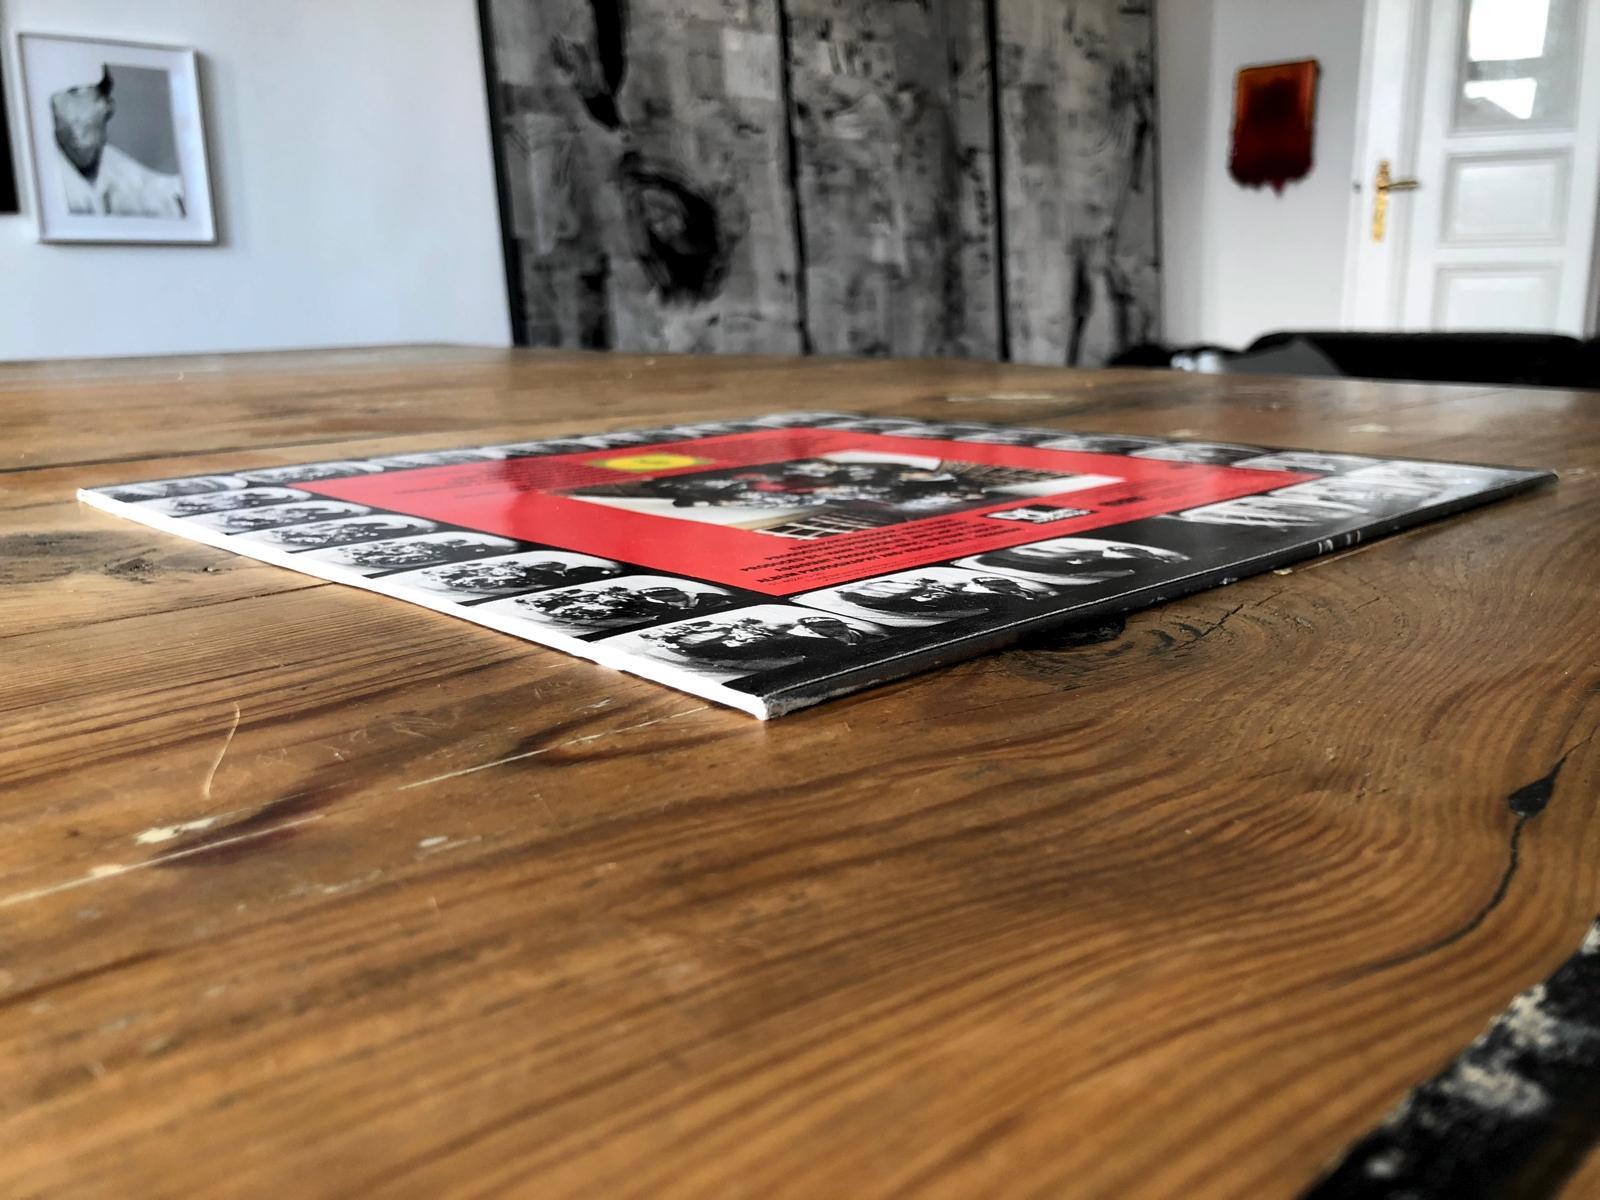 Public Enemy - Roundtable - 06